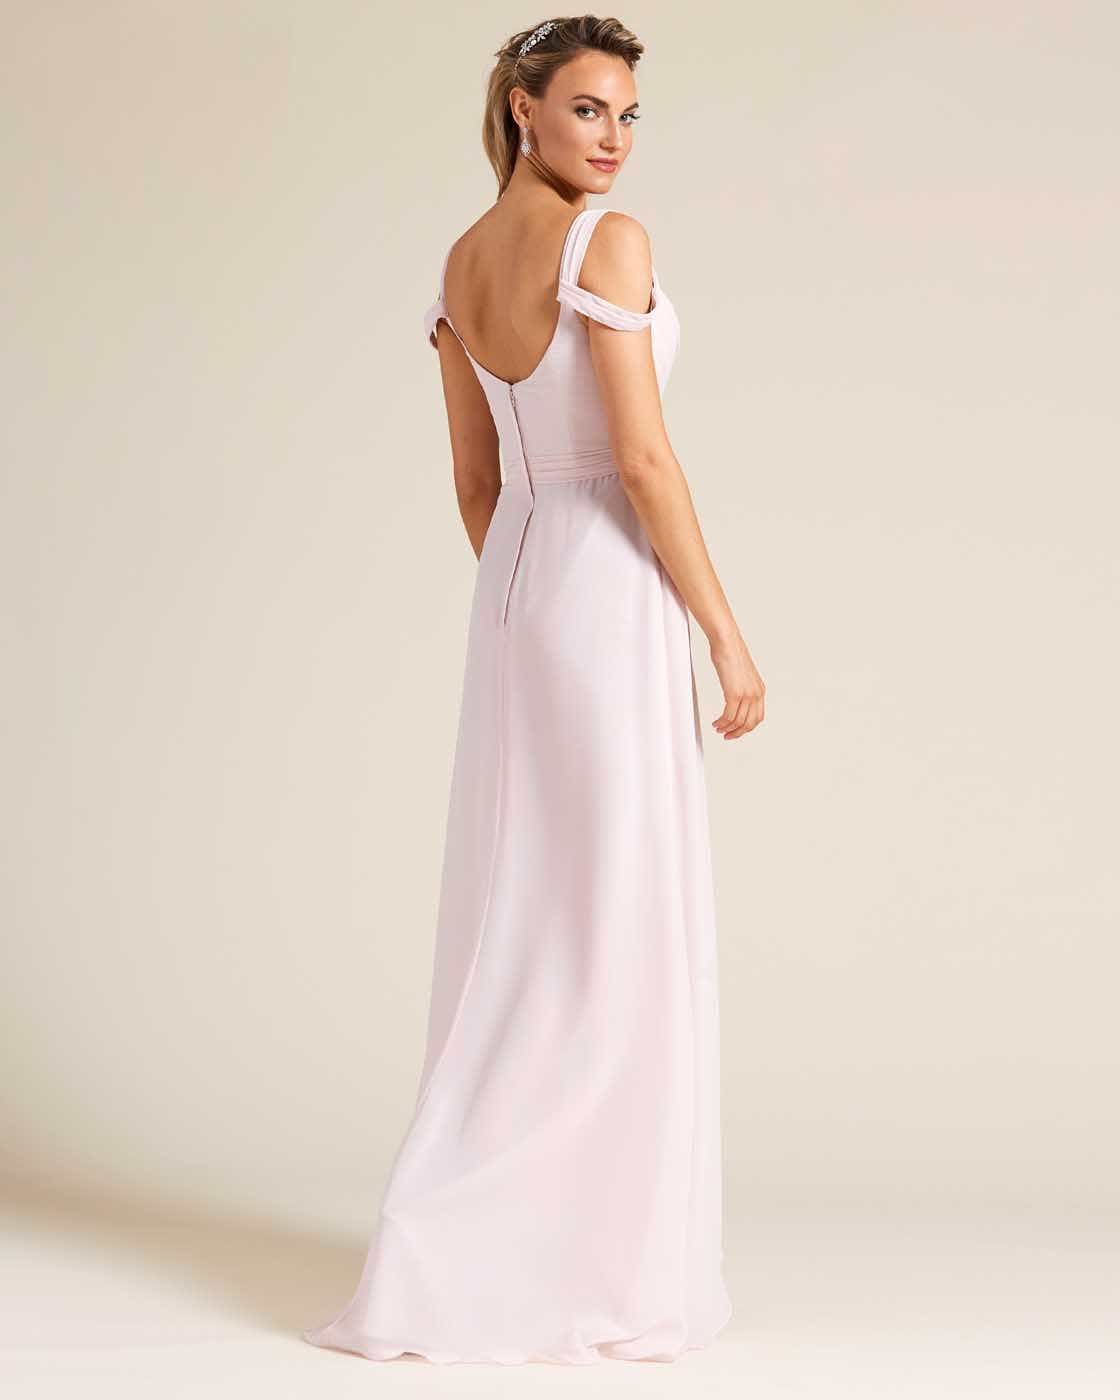 Light Pink Multi Strap Ruched Top Dress - Back